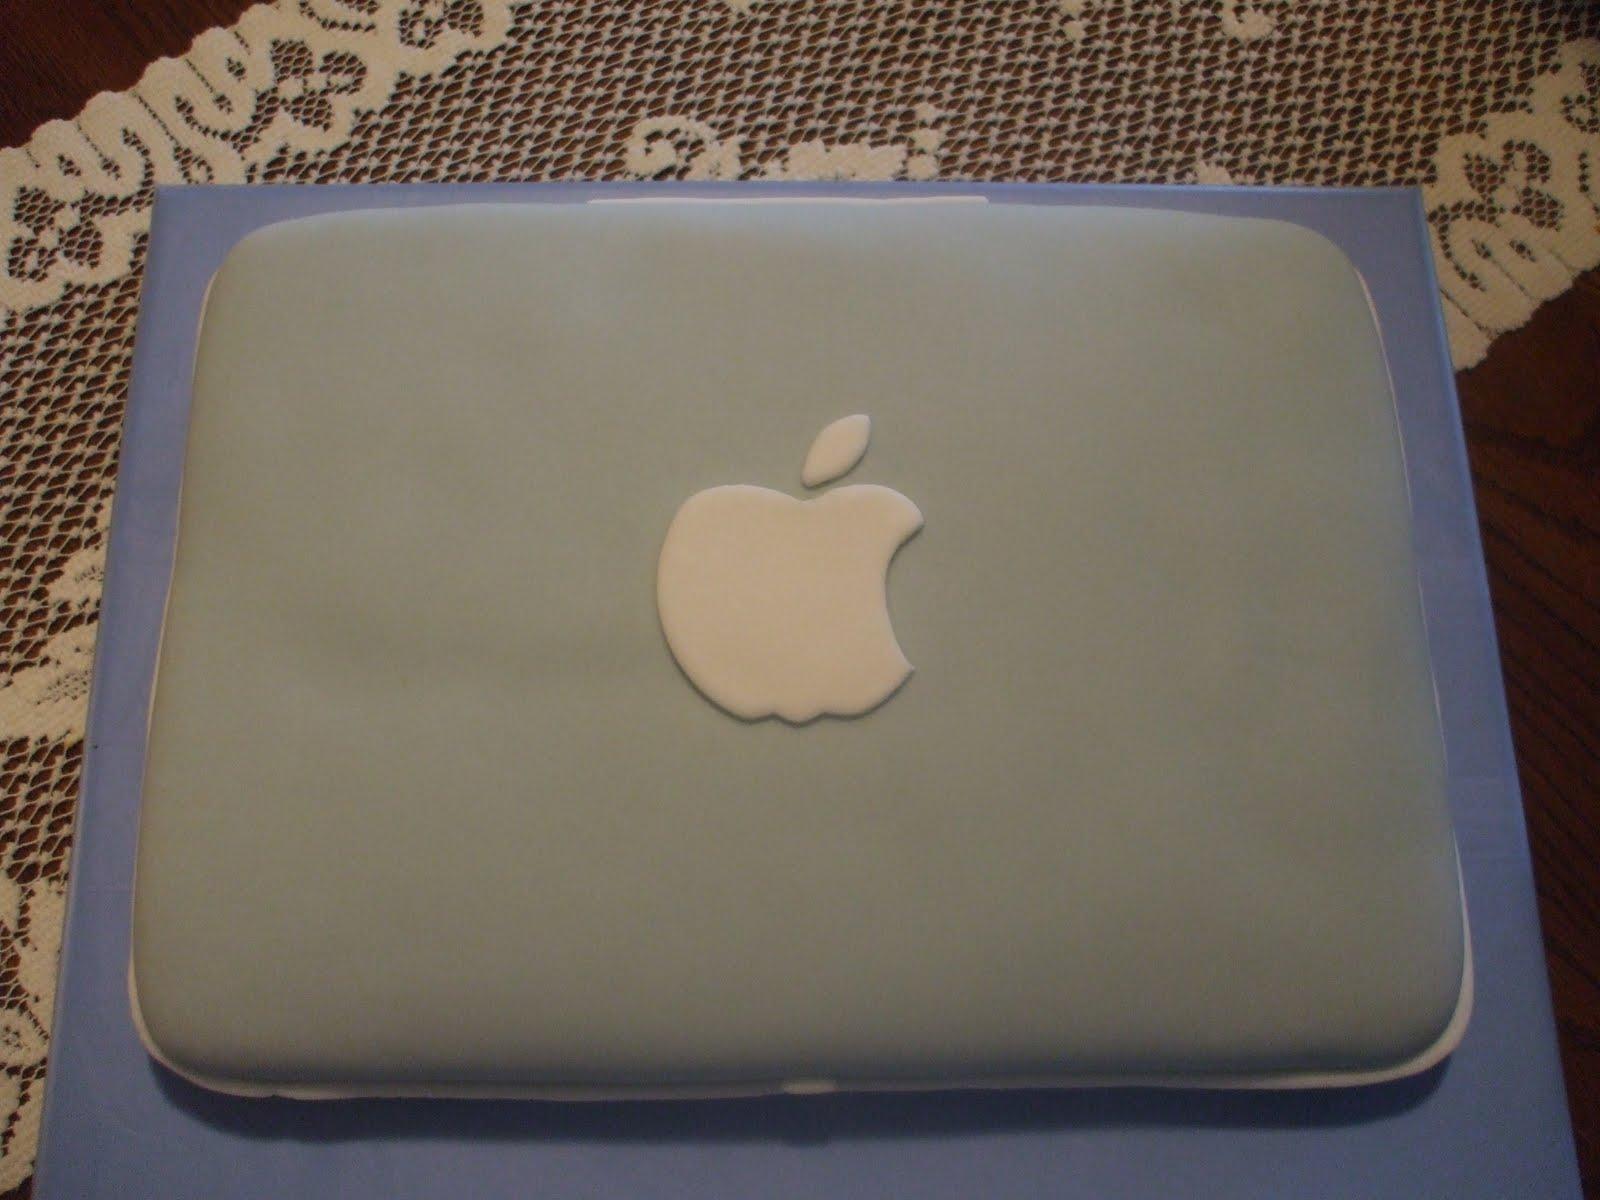 Cake Laptop Designs : The Simple Cake: Apple Laptop/Computer Cake